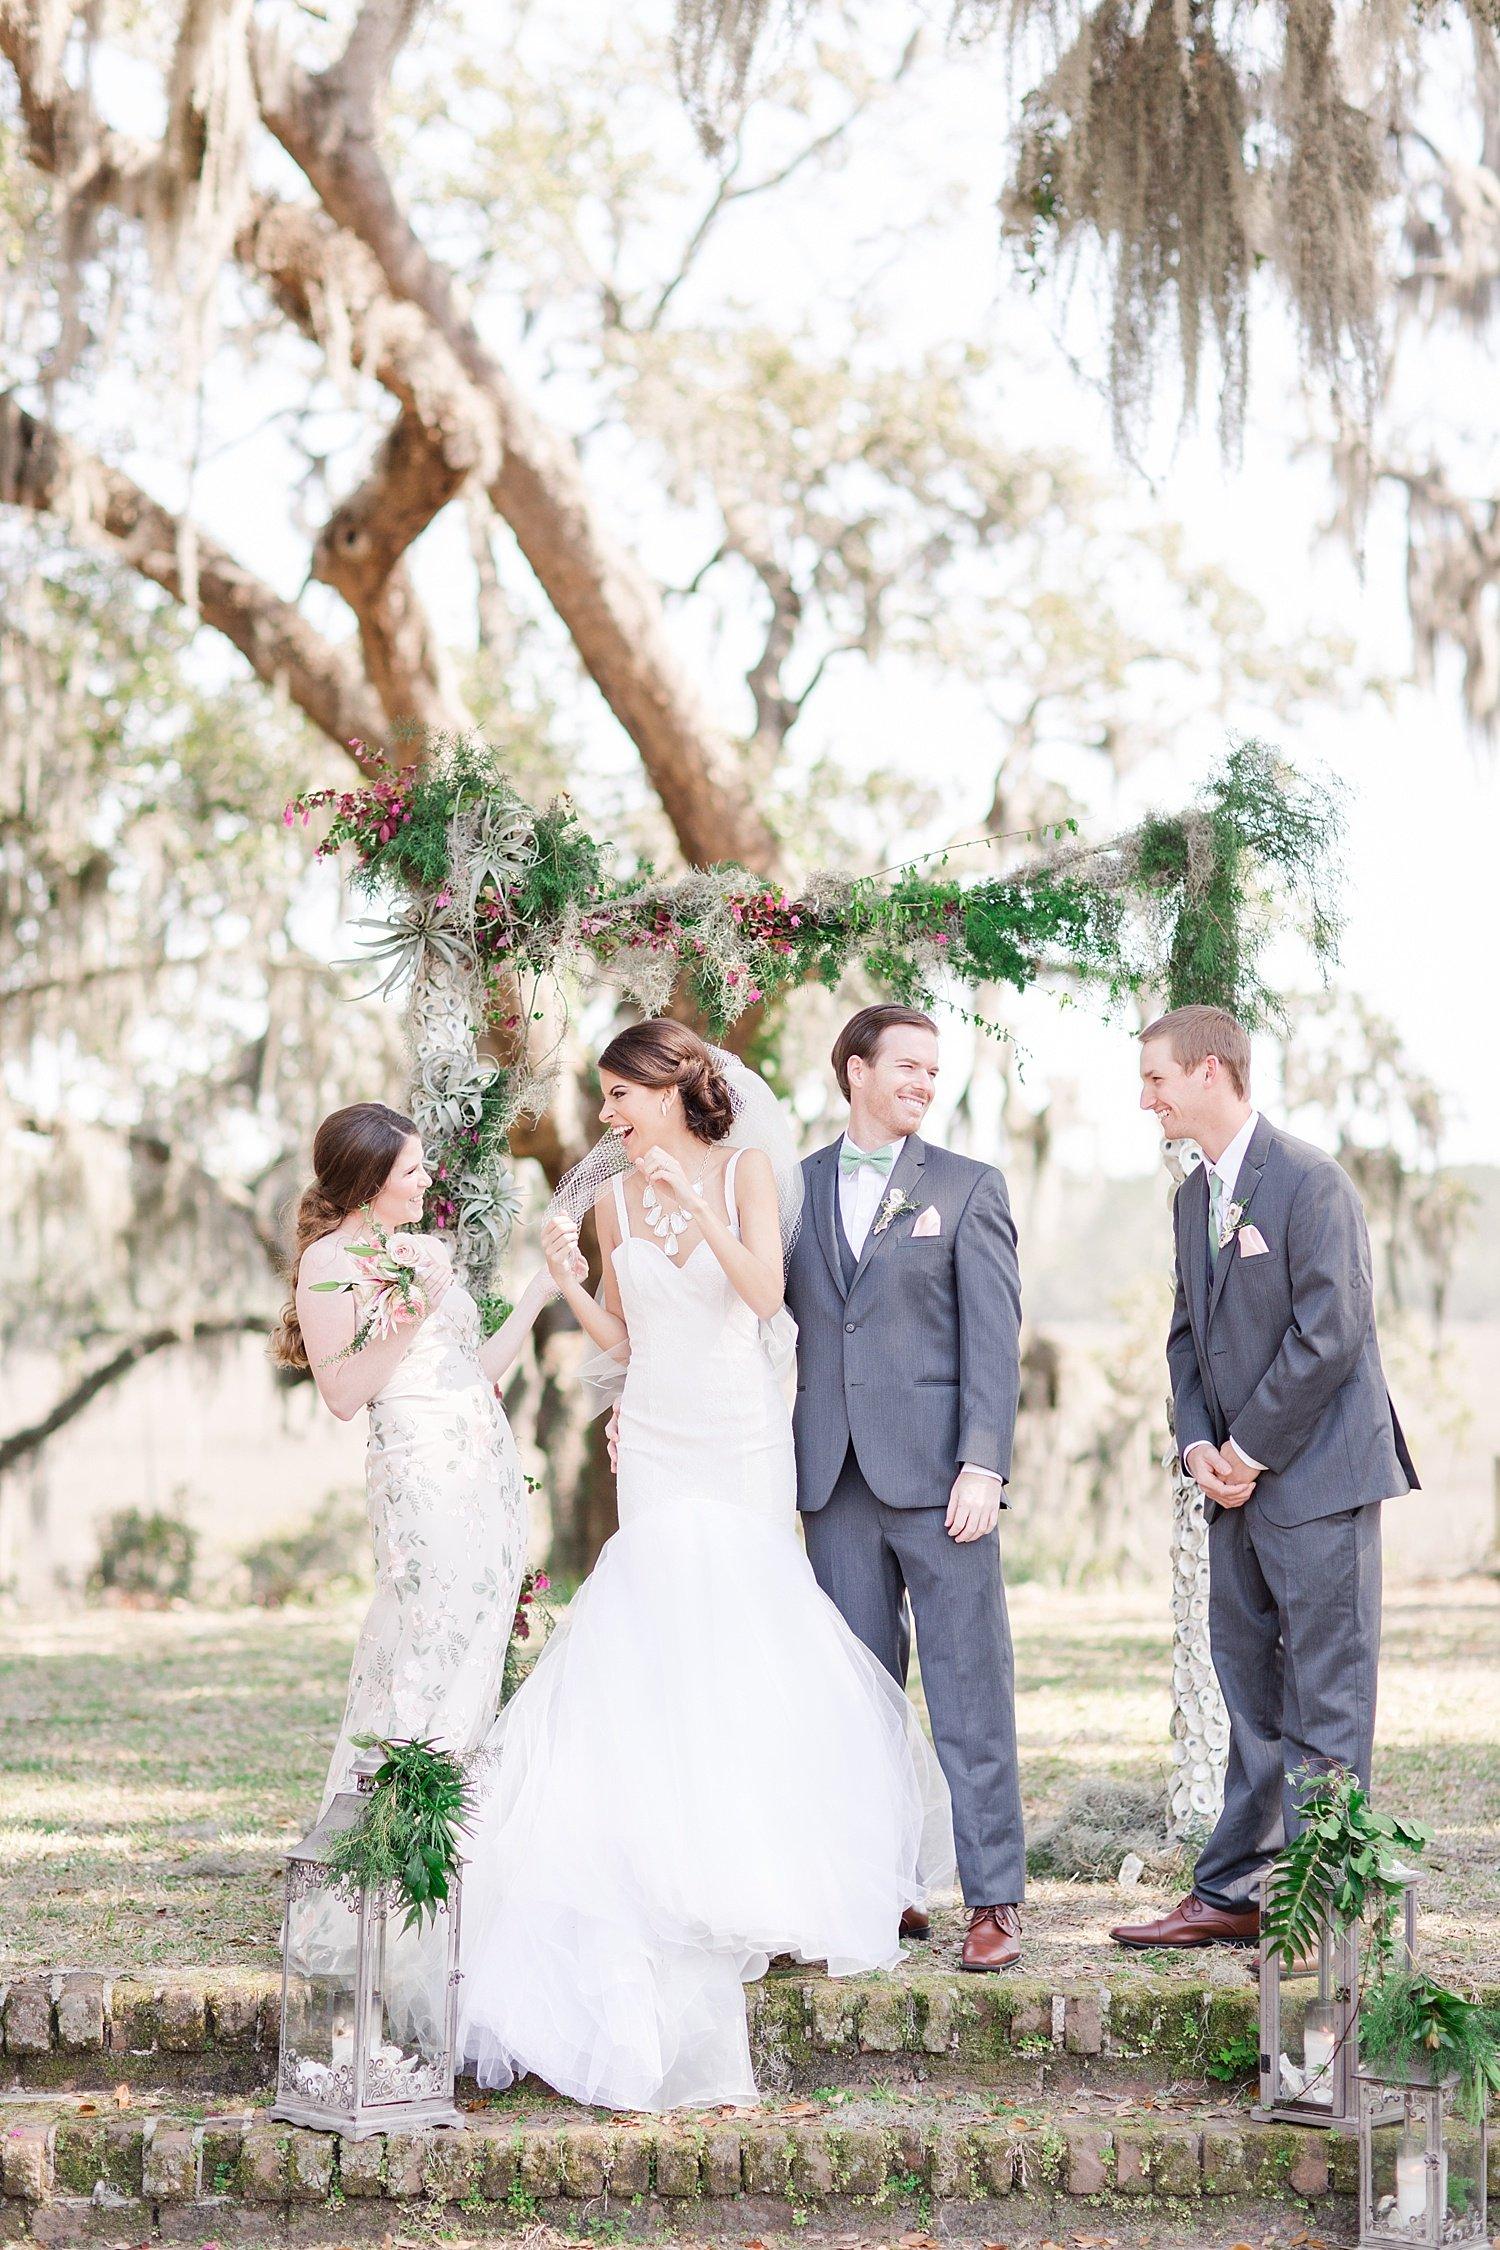 rachel-strickland-photography-katie-may-ivory-and-beau-bridal-boutique-bethesda-academy-wedding-whitfield-chapel-wedding-savannah-bridal-boutique-savannah-weddings-savannah-wedding-savannah-wedding-planner-savannah-bridal-gowns-savannah-bride-14.jpg